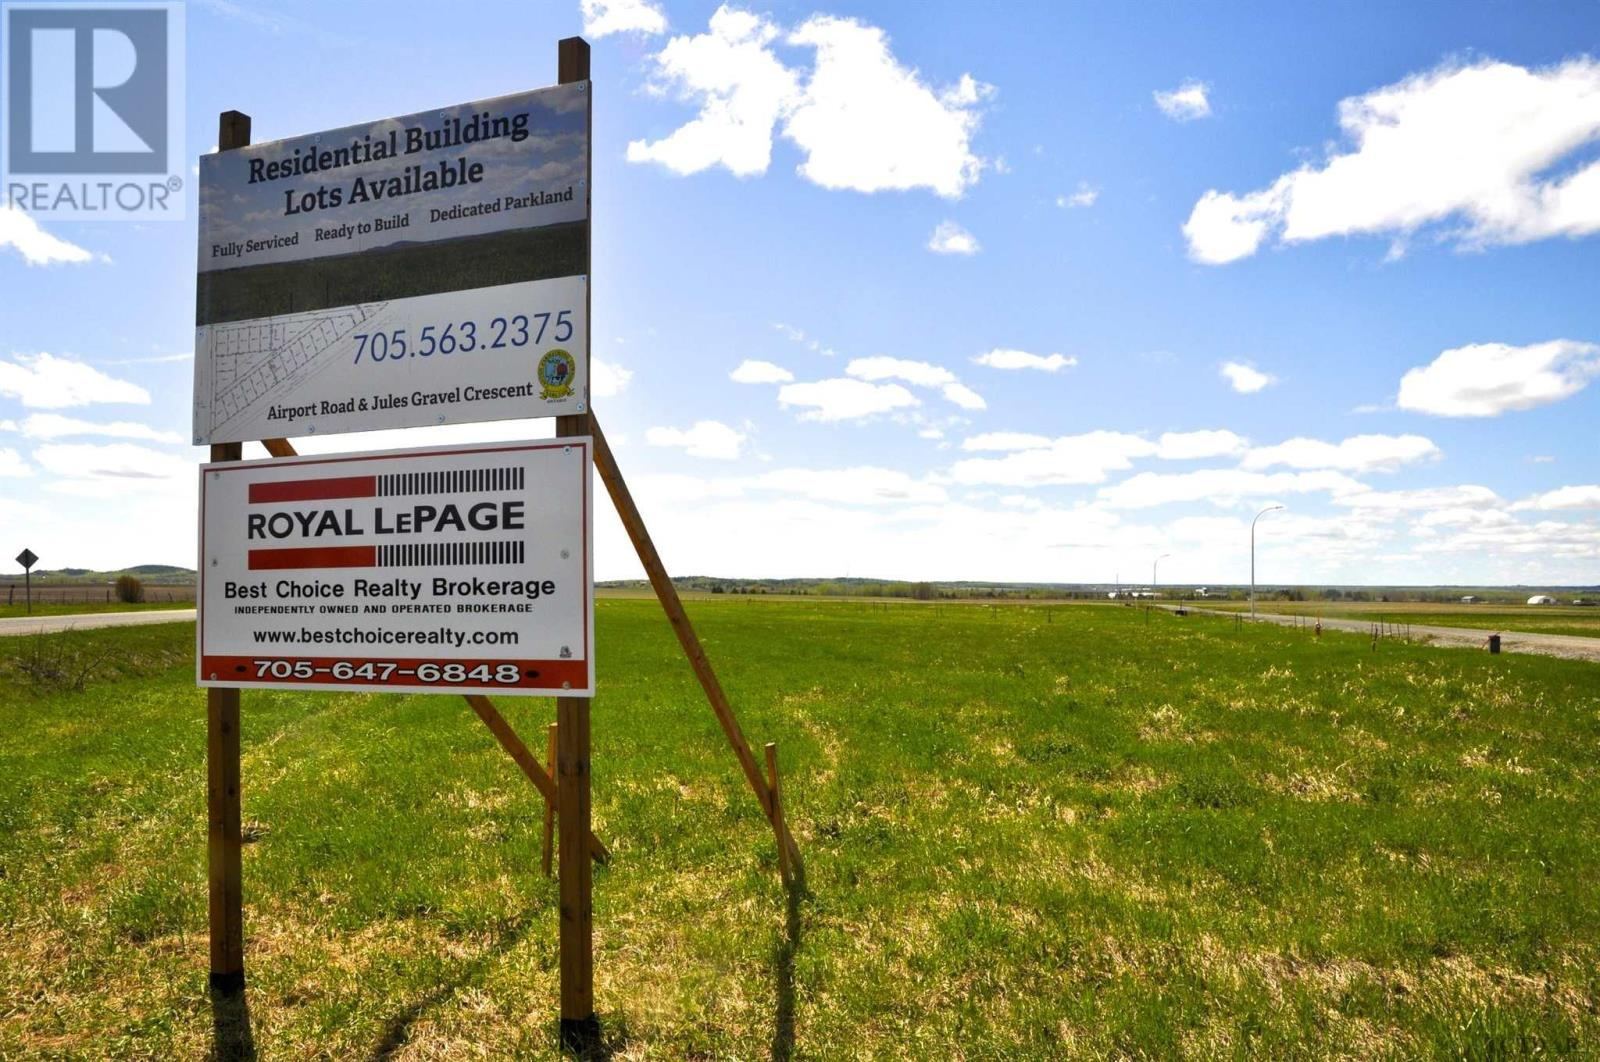 086013 Airport Rd, Earlton, Ontario  P0J 1E0 - Photo 2 - TM191007